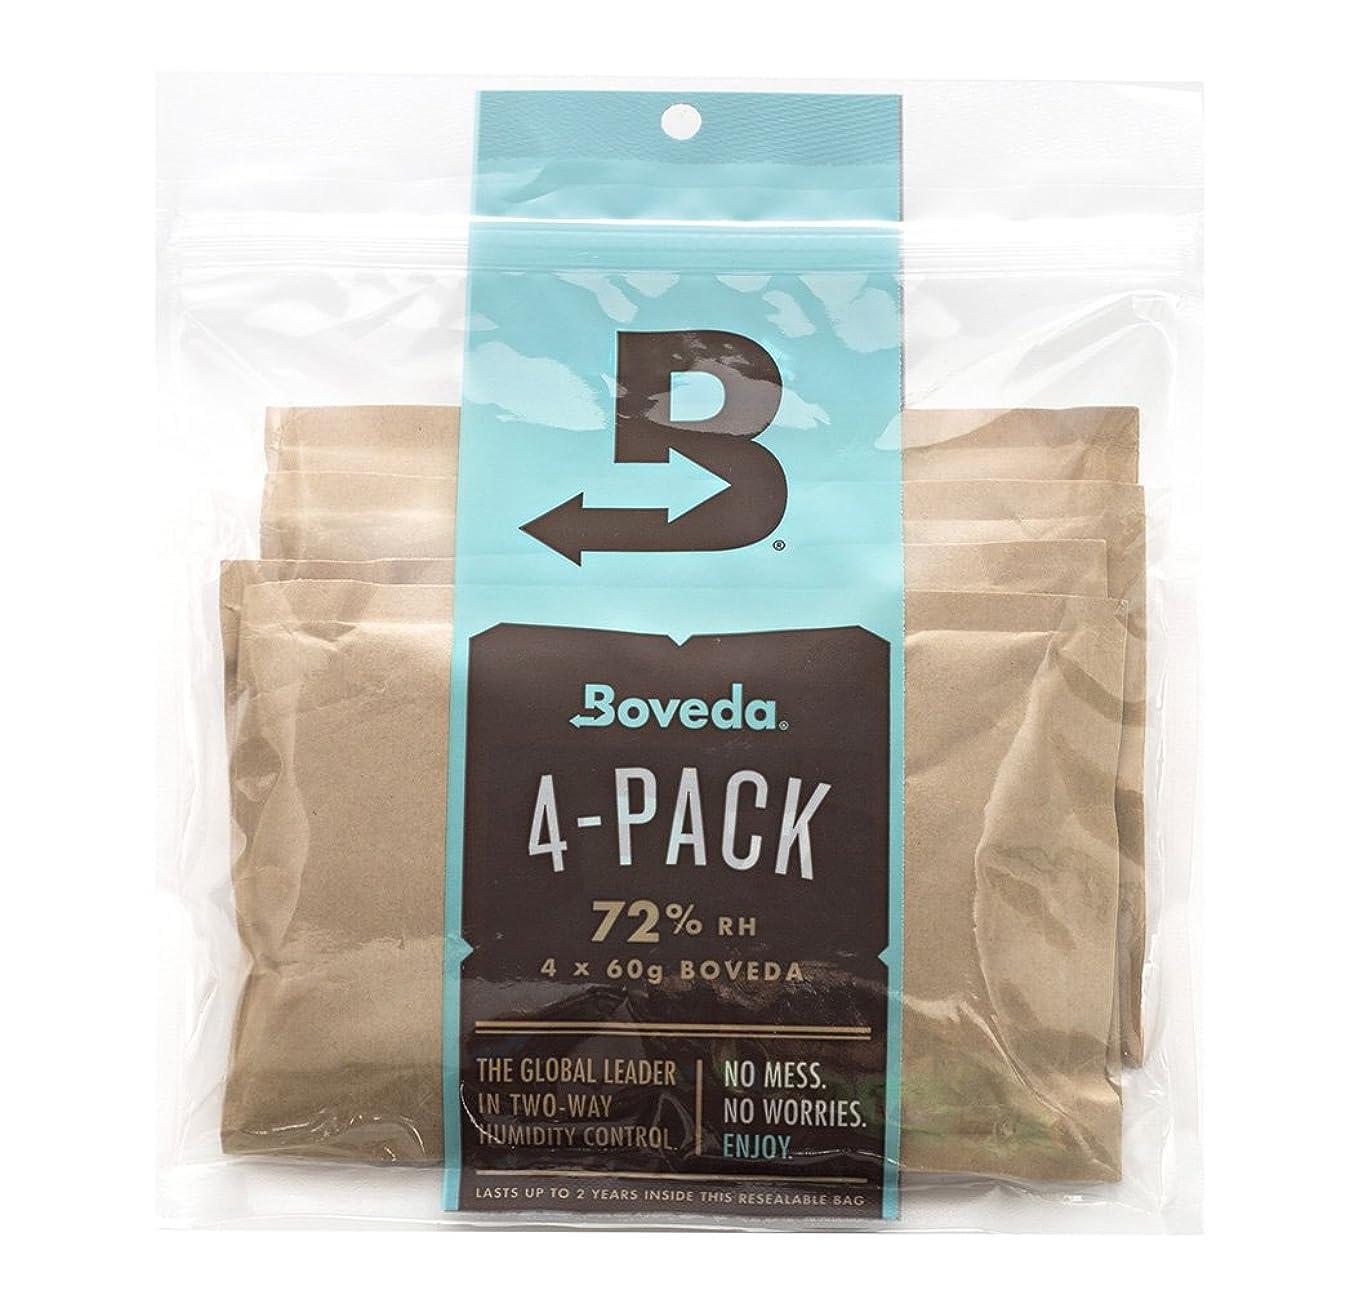 Boveda 72 Percent RH 2-Way Humidity Control, Large, 60 gram, 4-Pack